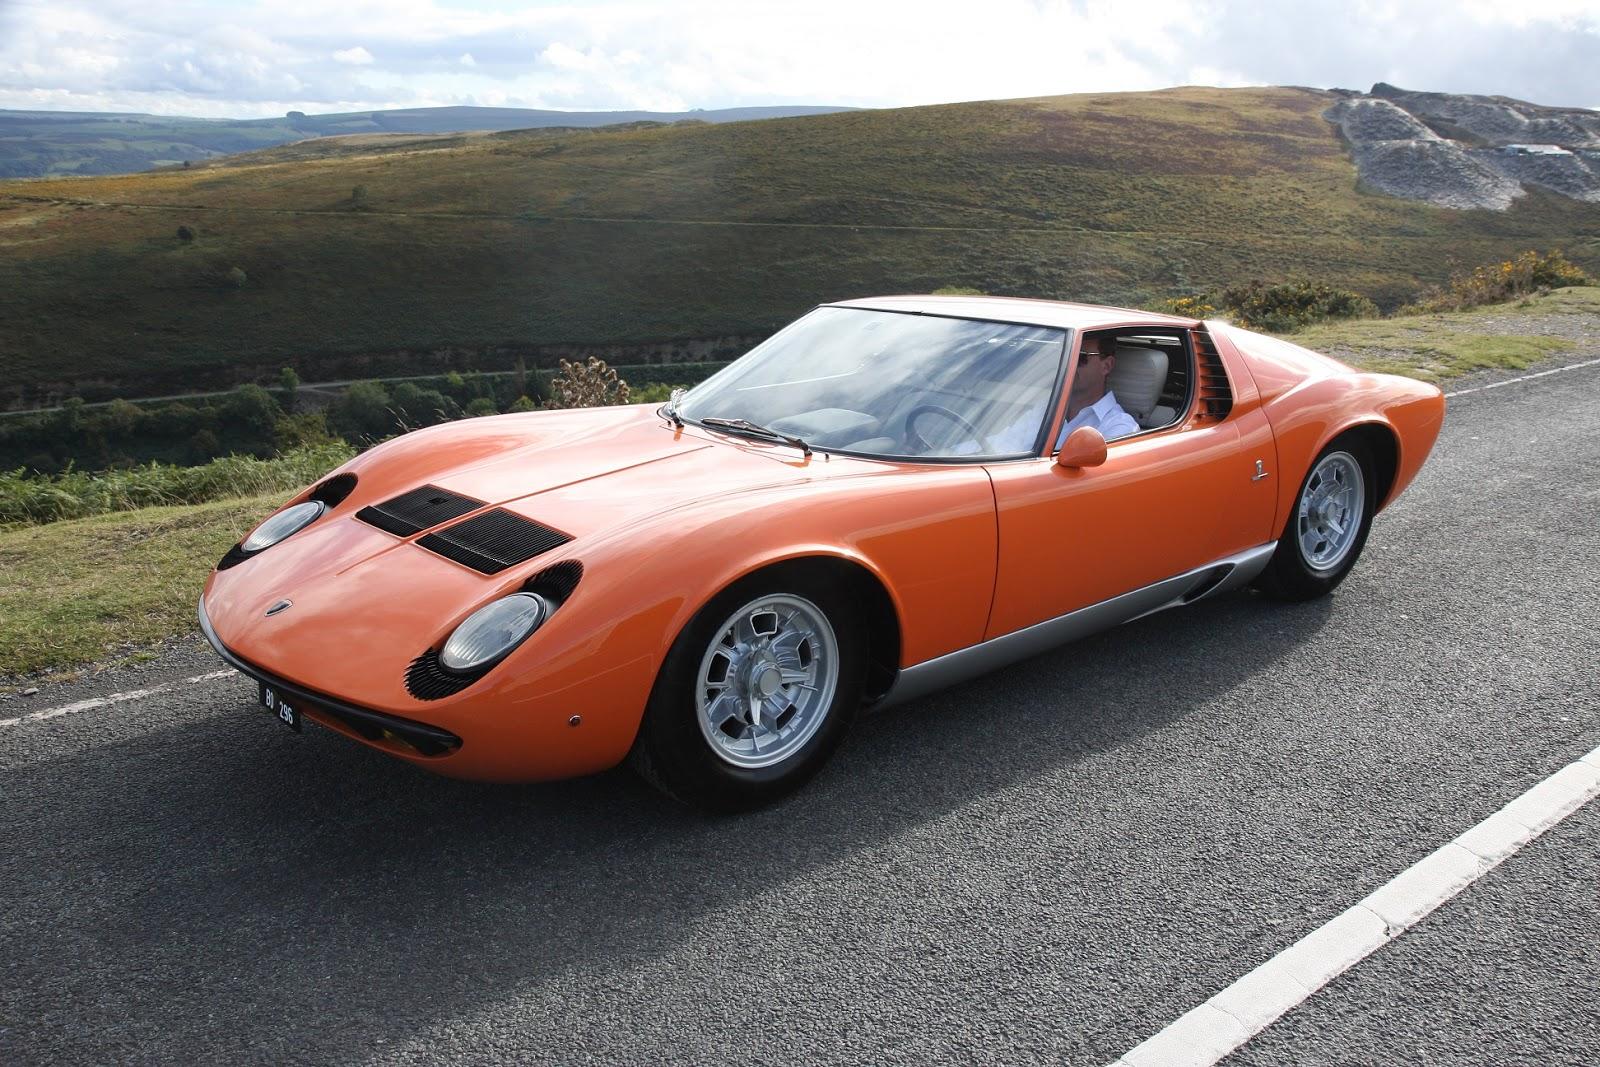 Lamborghini Cars News Miura From The Italian Job For Sale